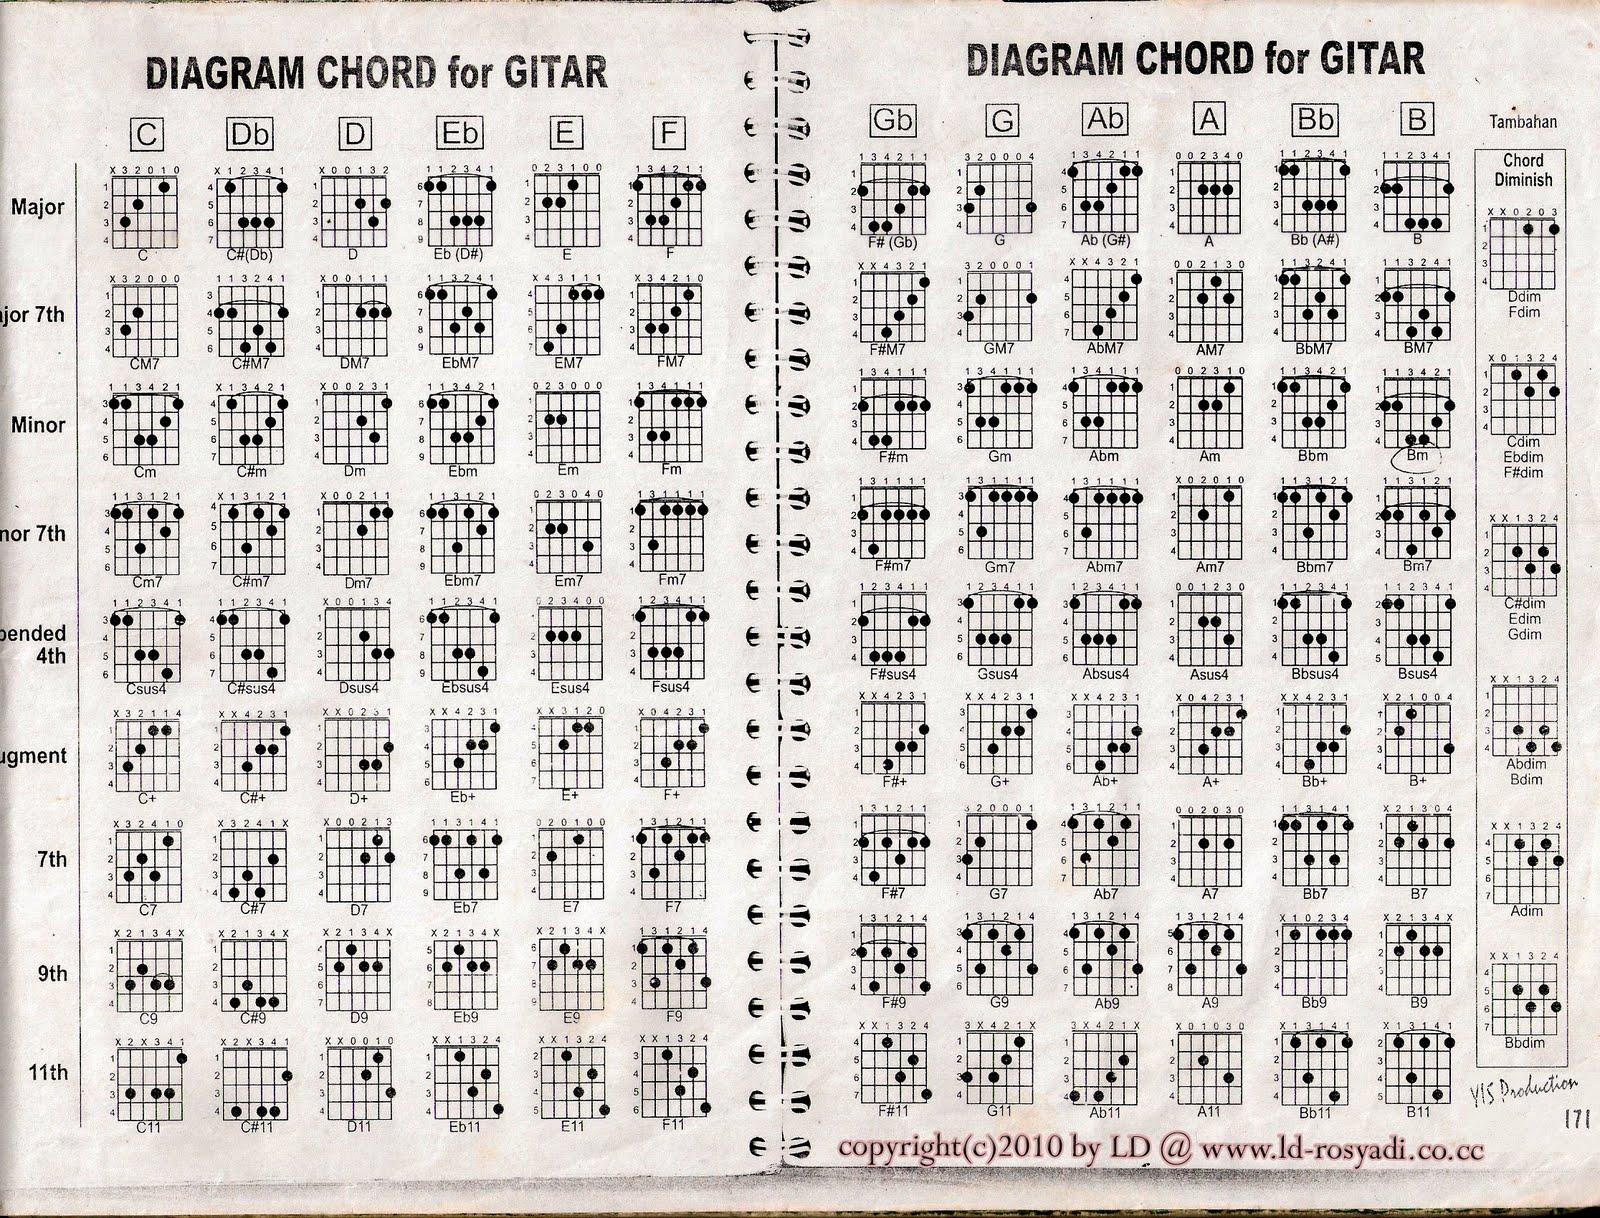 Chord_of_Guitar0001.jpg